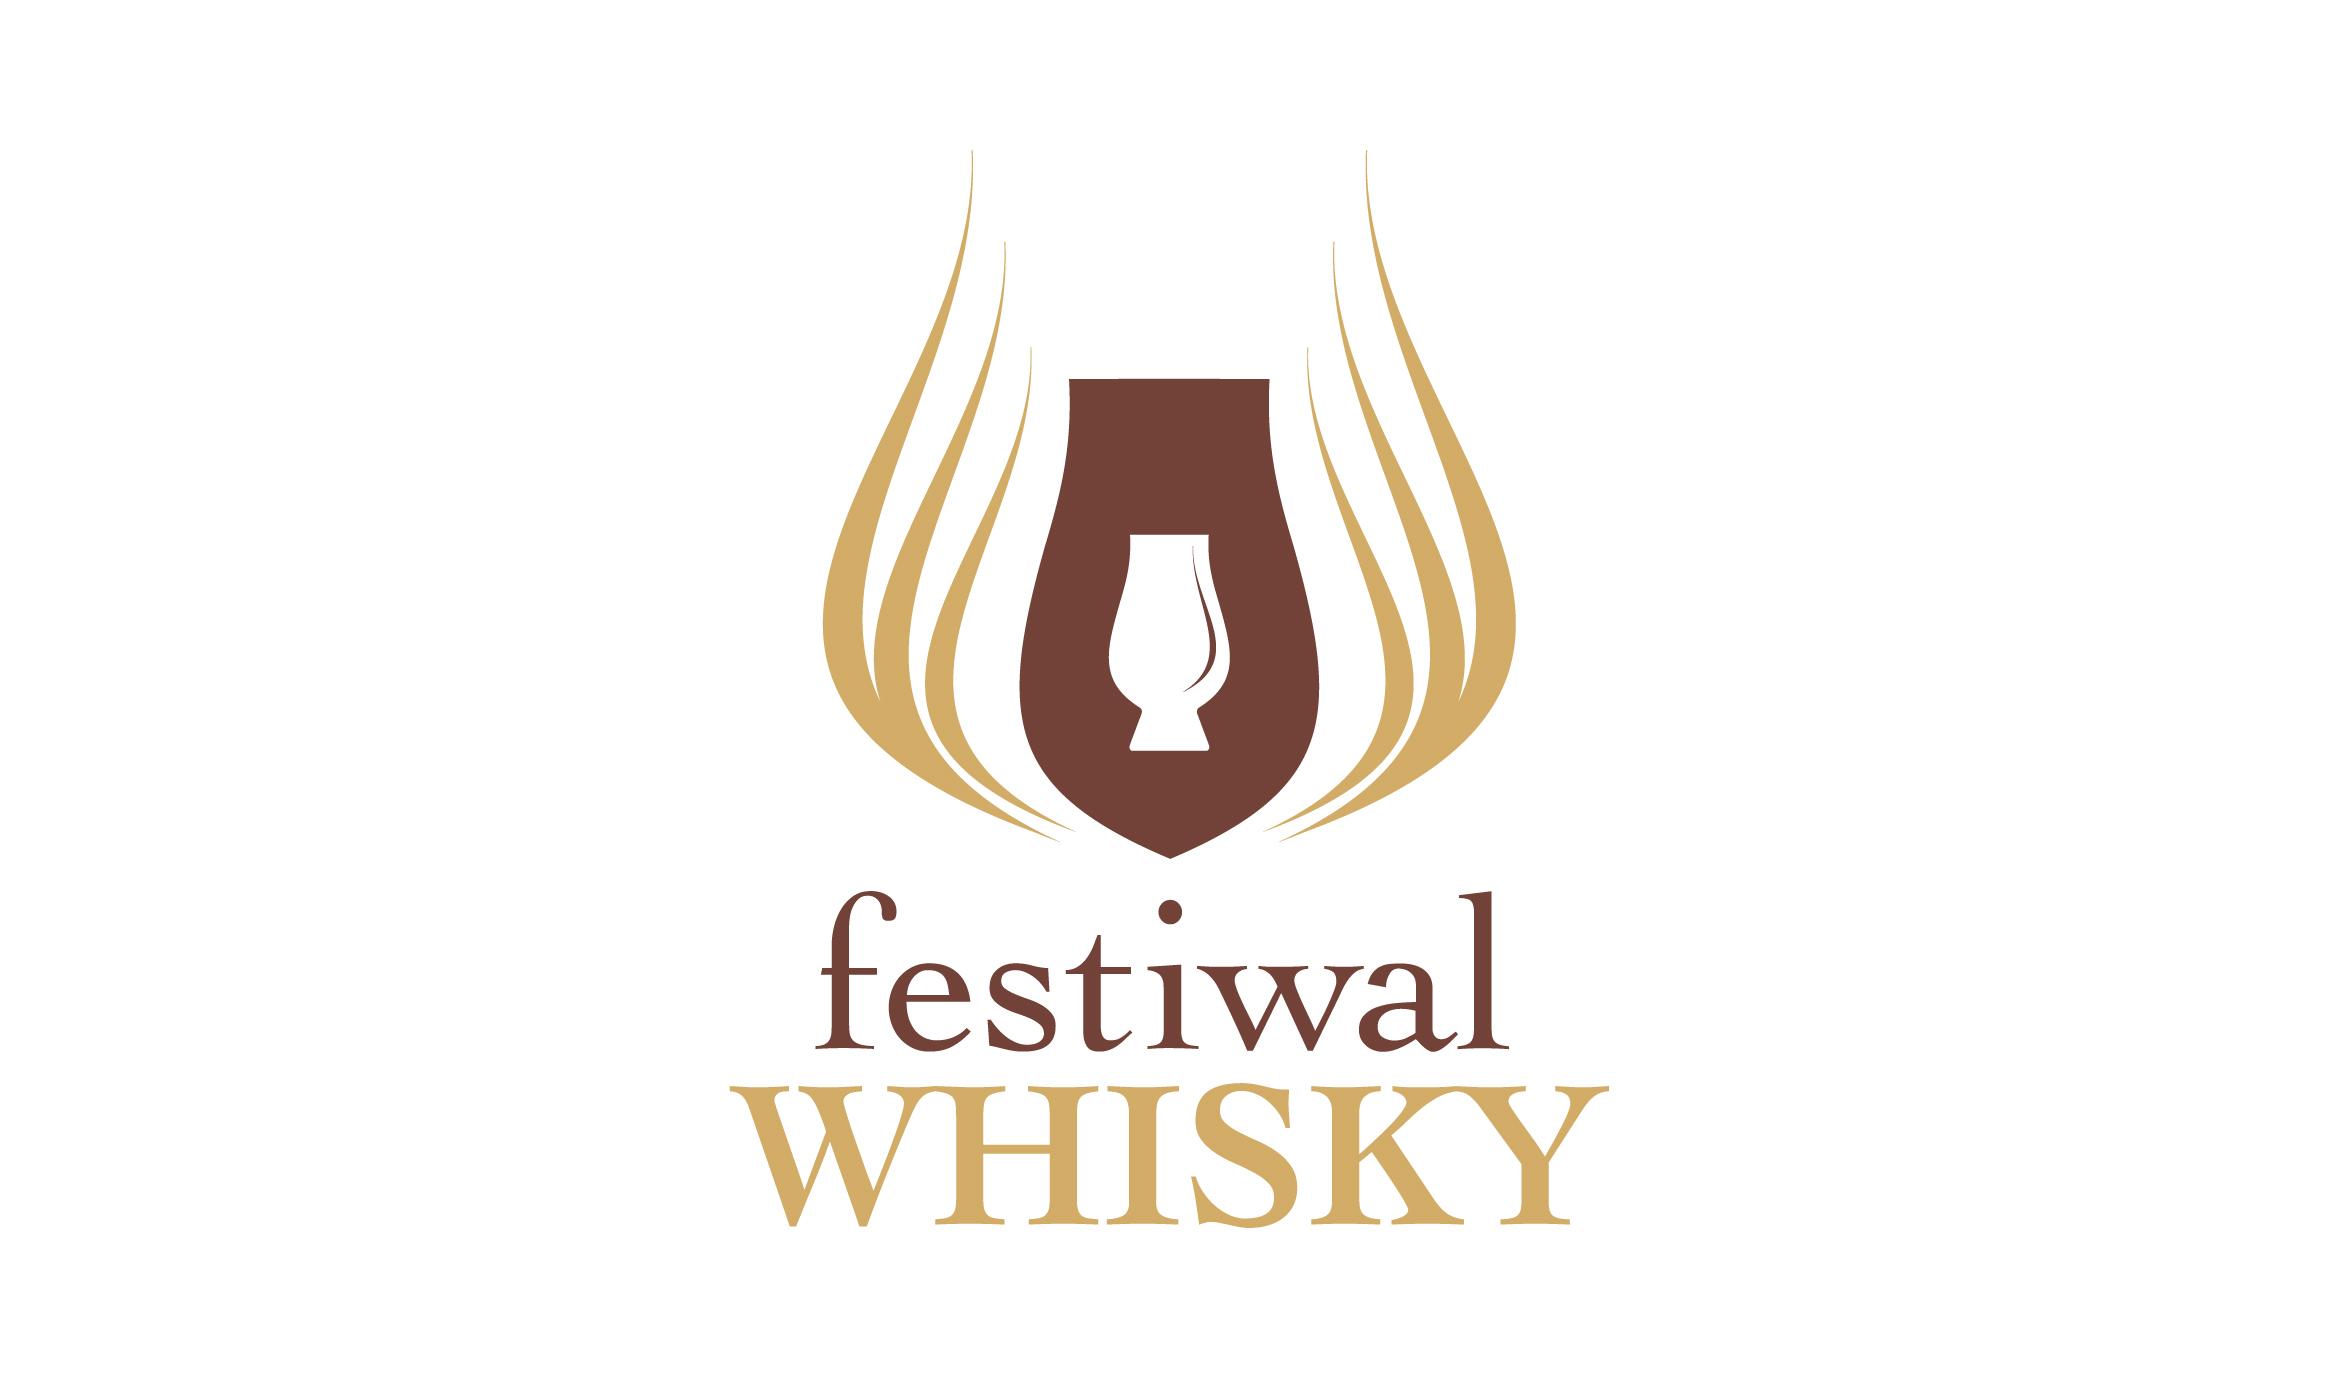 magazynkobiet.pl - festiwal whisky logo - Festiwal Whisky Jastrzębia Góra IV edycja